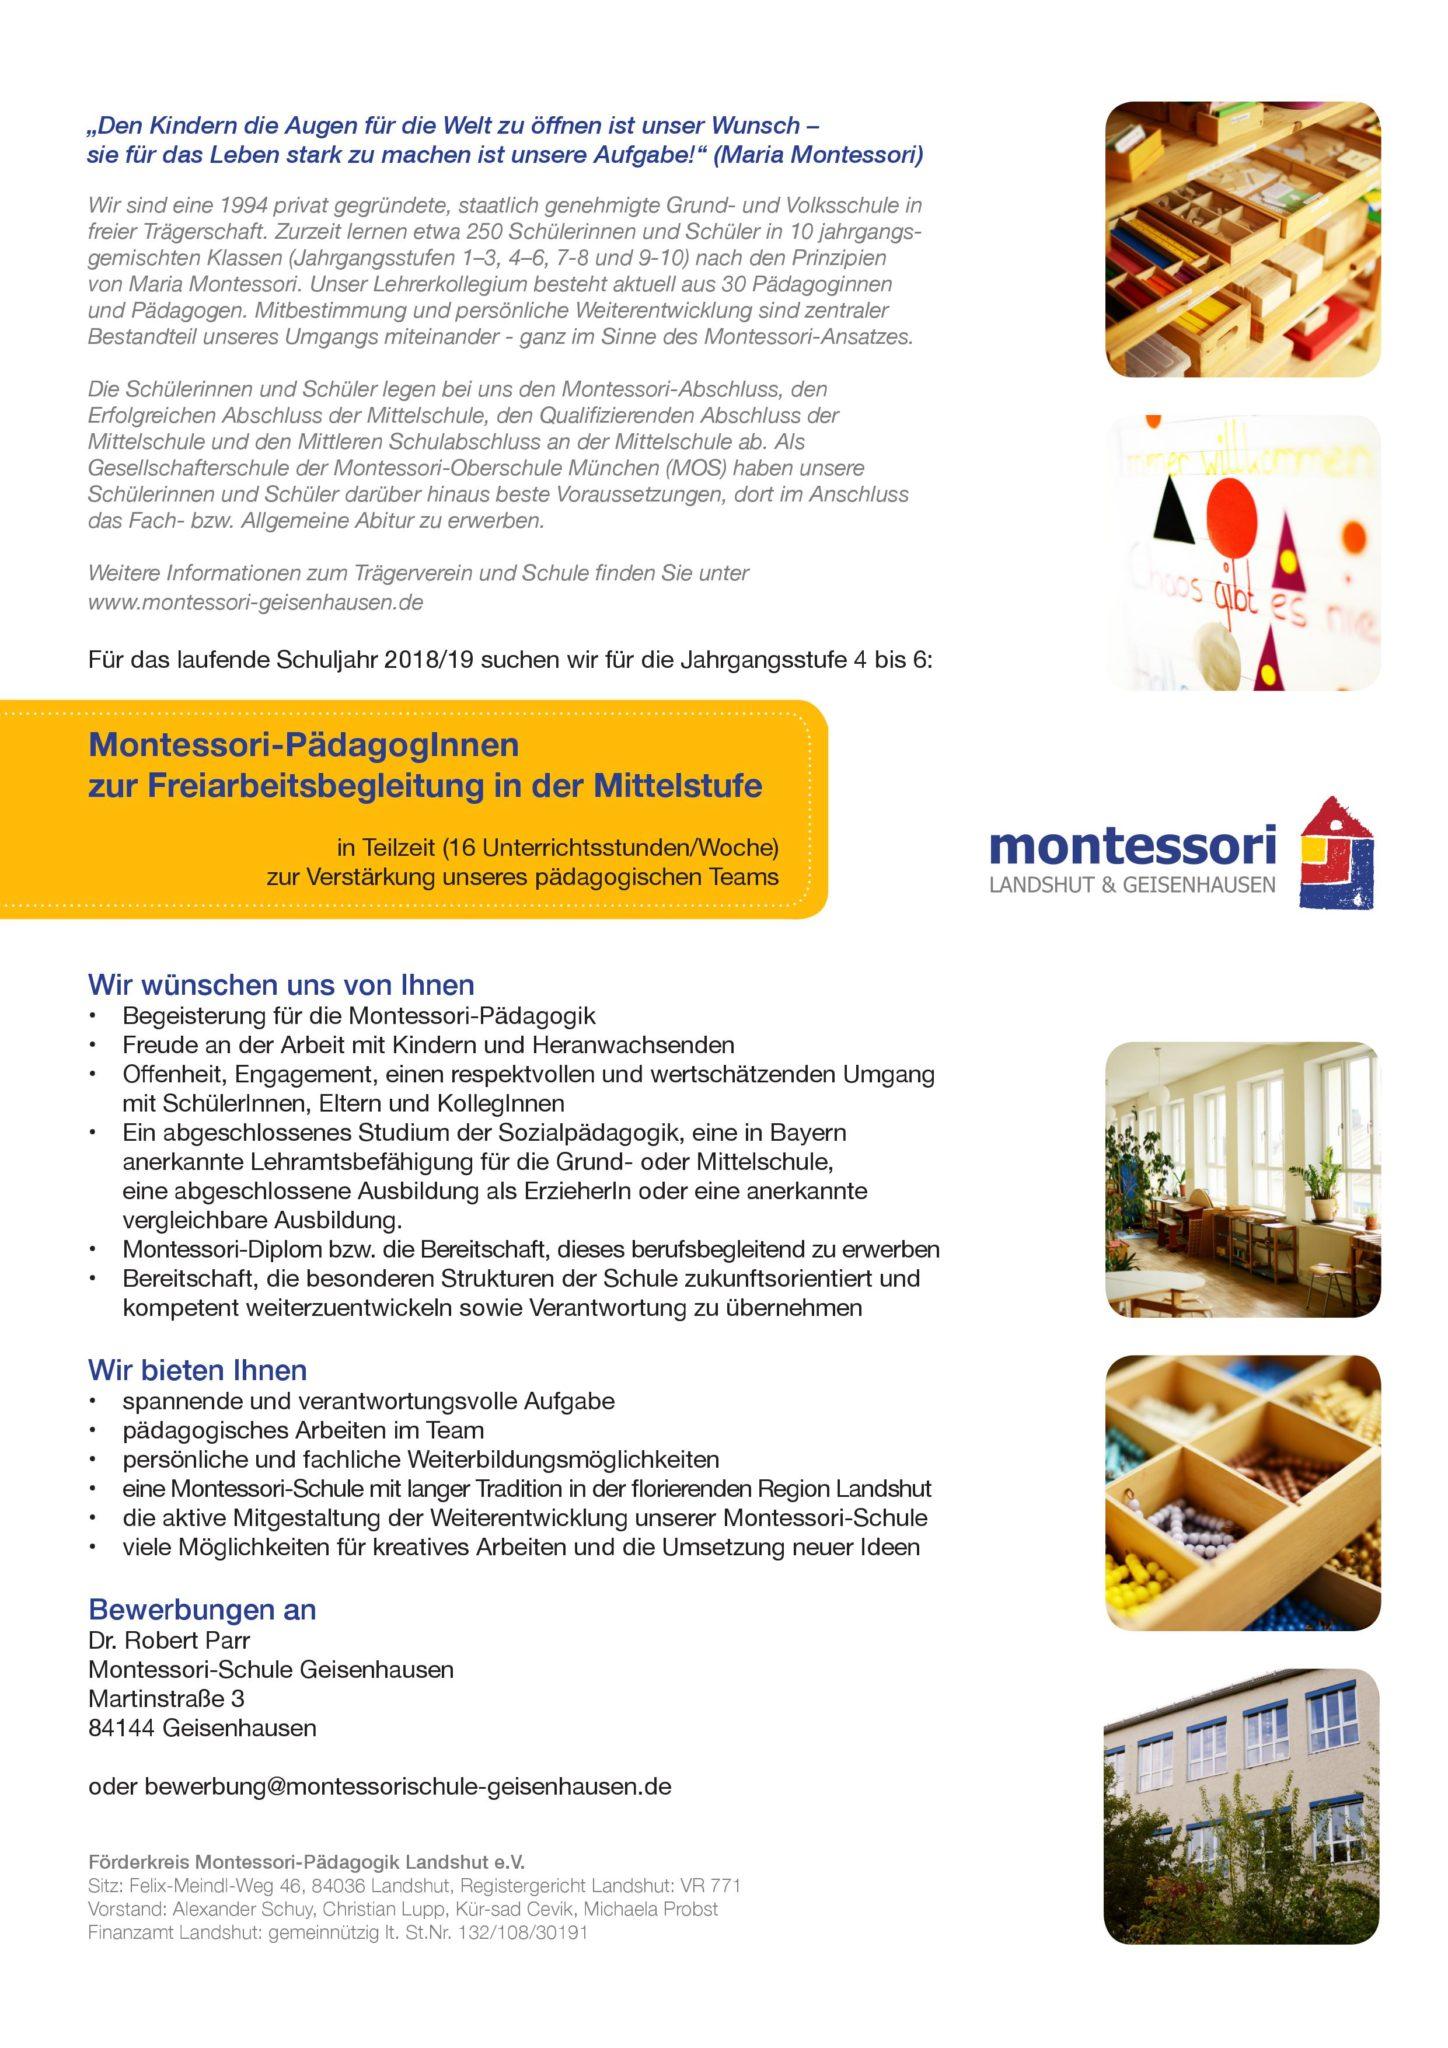 stellenangebote back montessori landshut geisenhausen. Black Bedroom Furniture Sets. Home Design Ideas